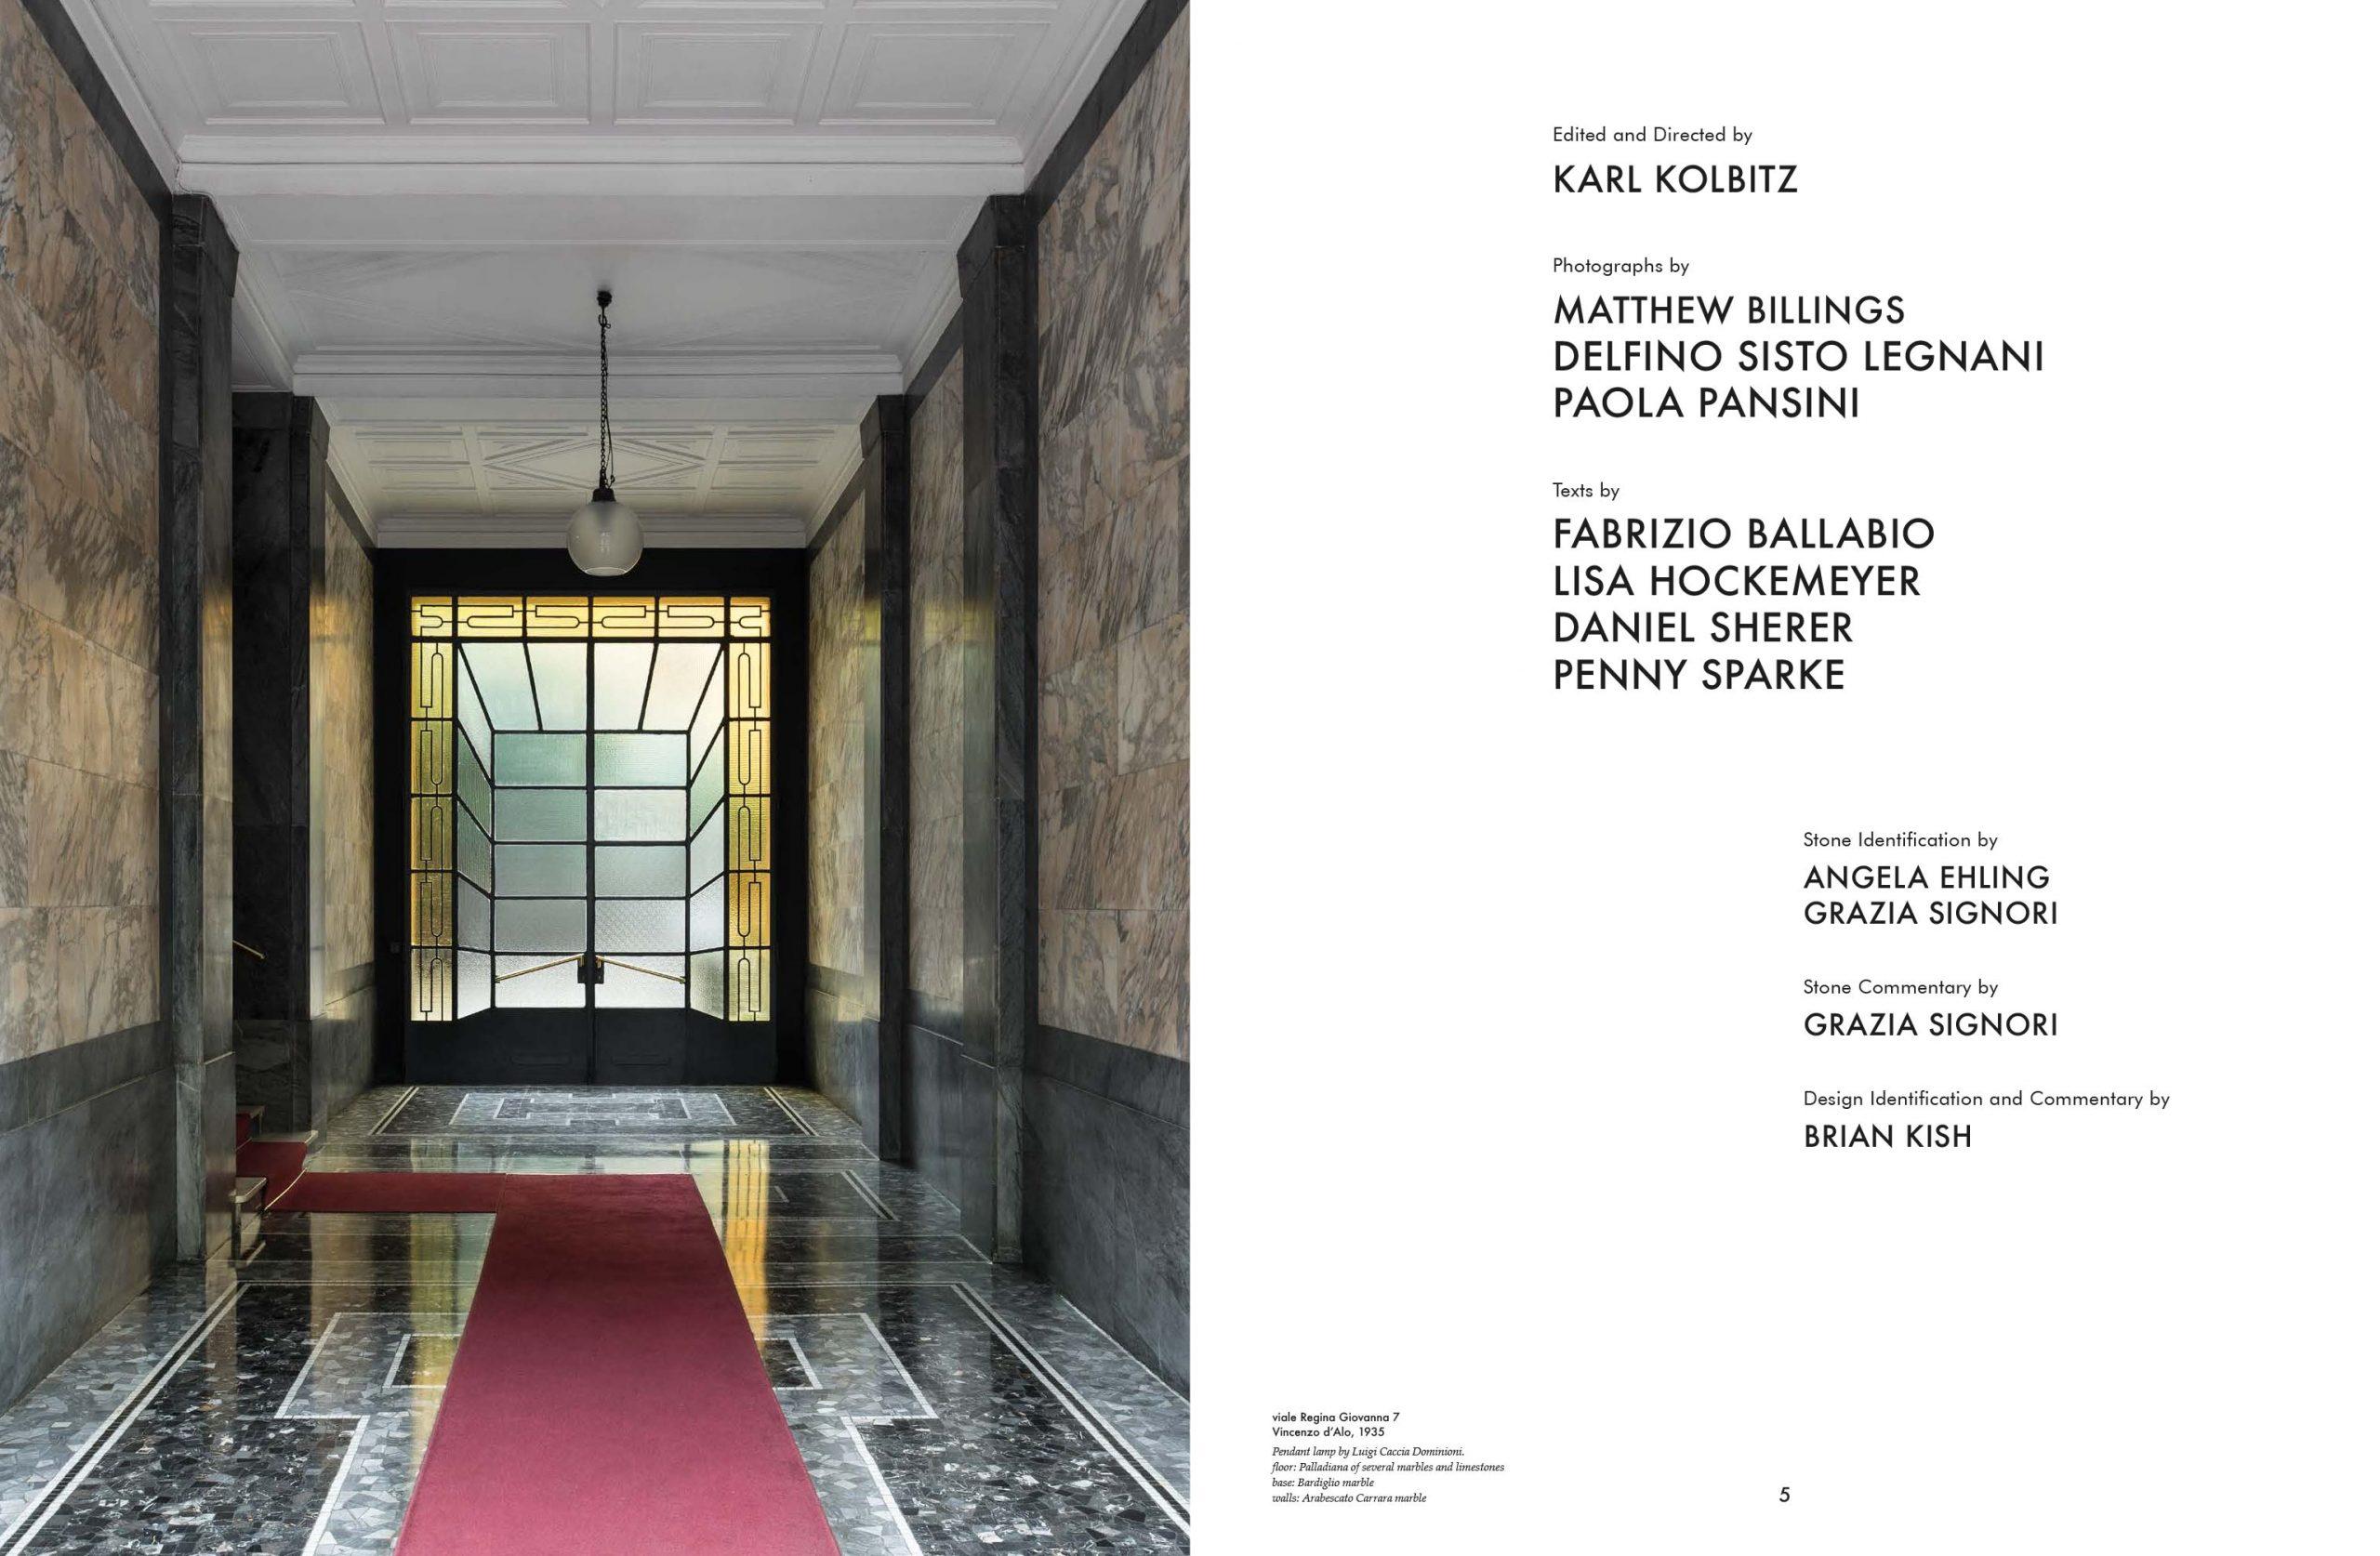 nicoletta-dalfino-karl-kolbitz-entryways-of-milan-taschen-pp4-5-scaled